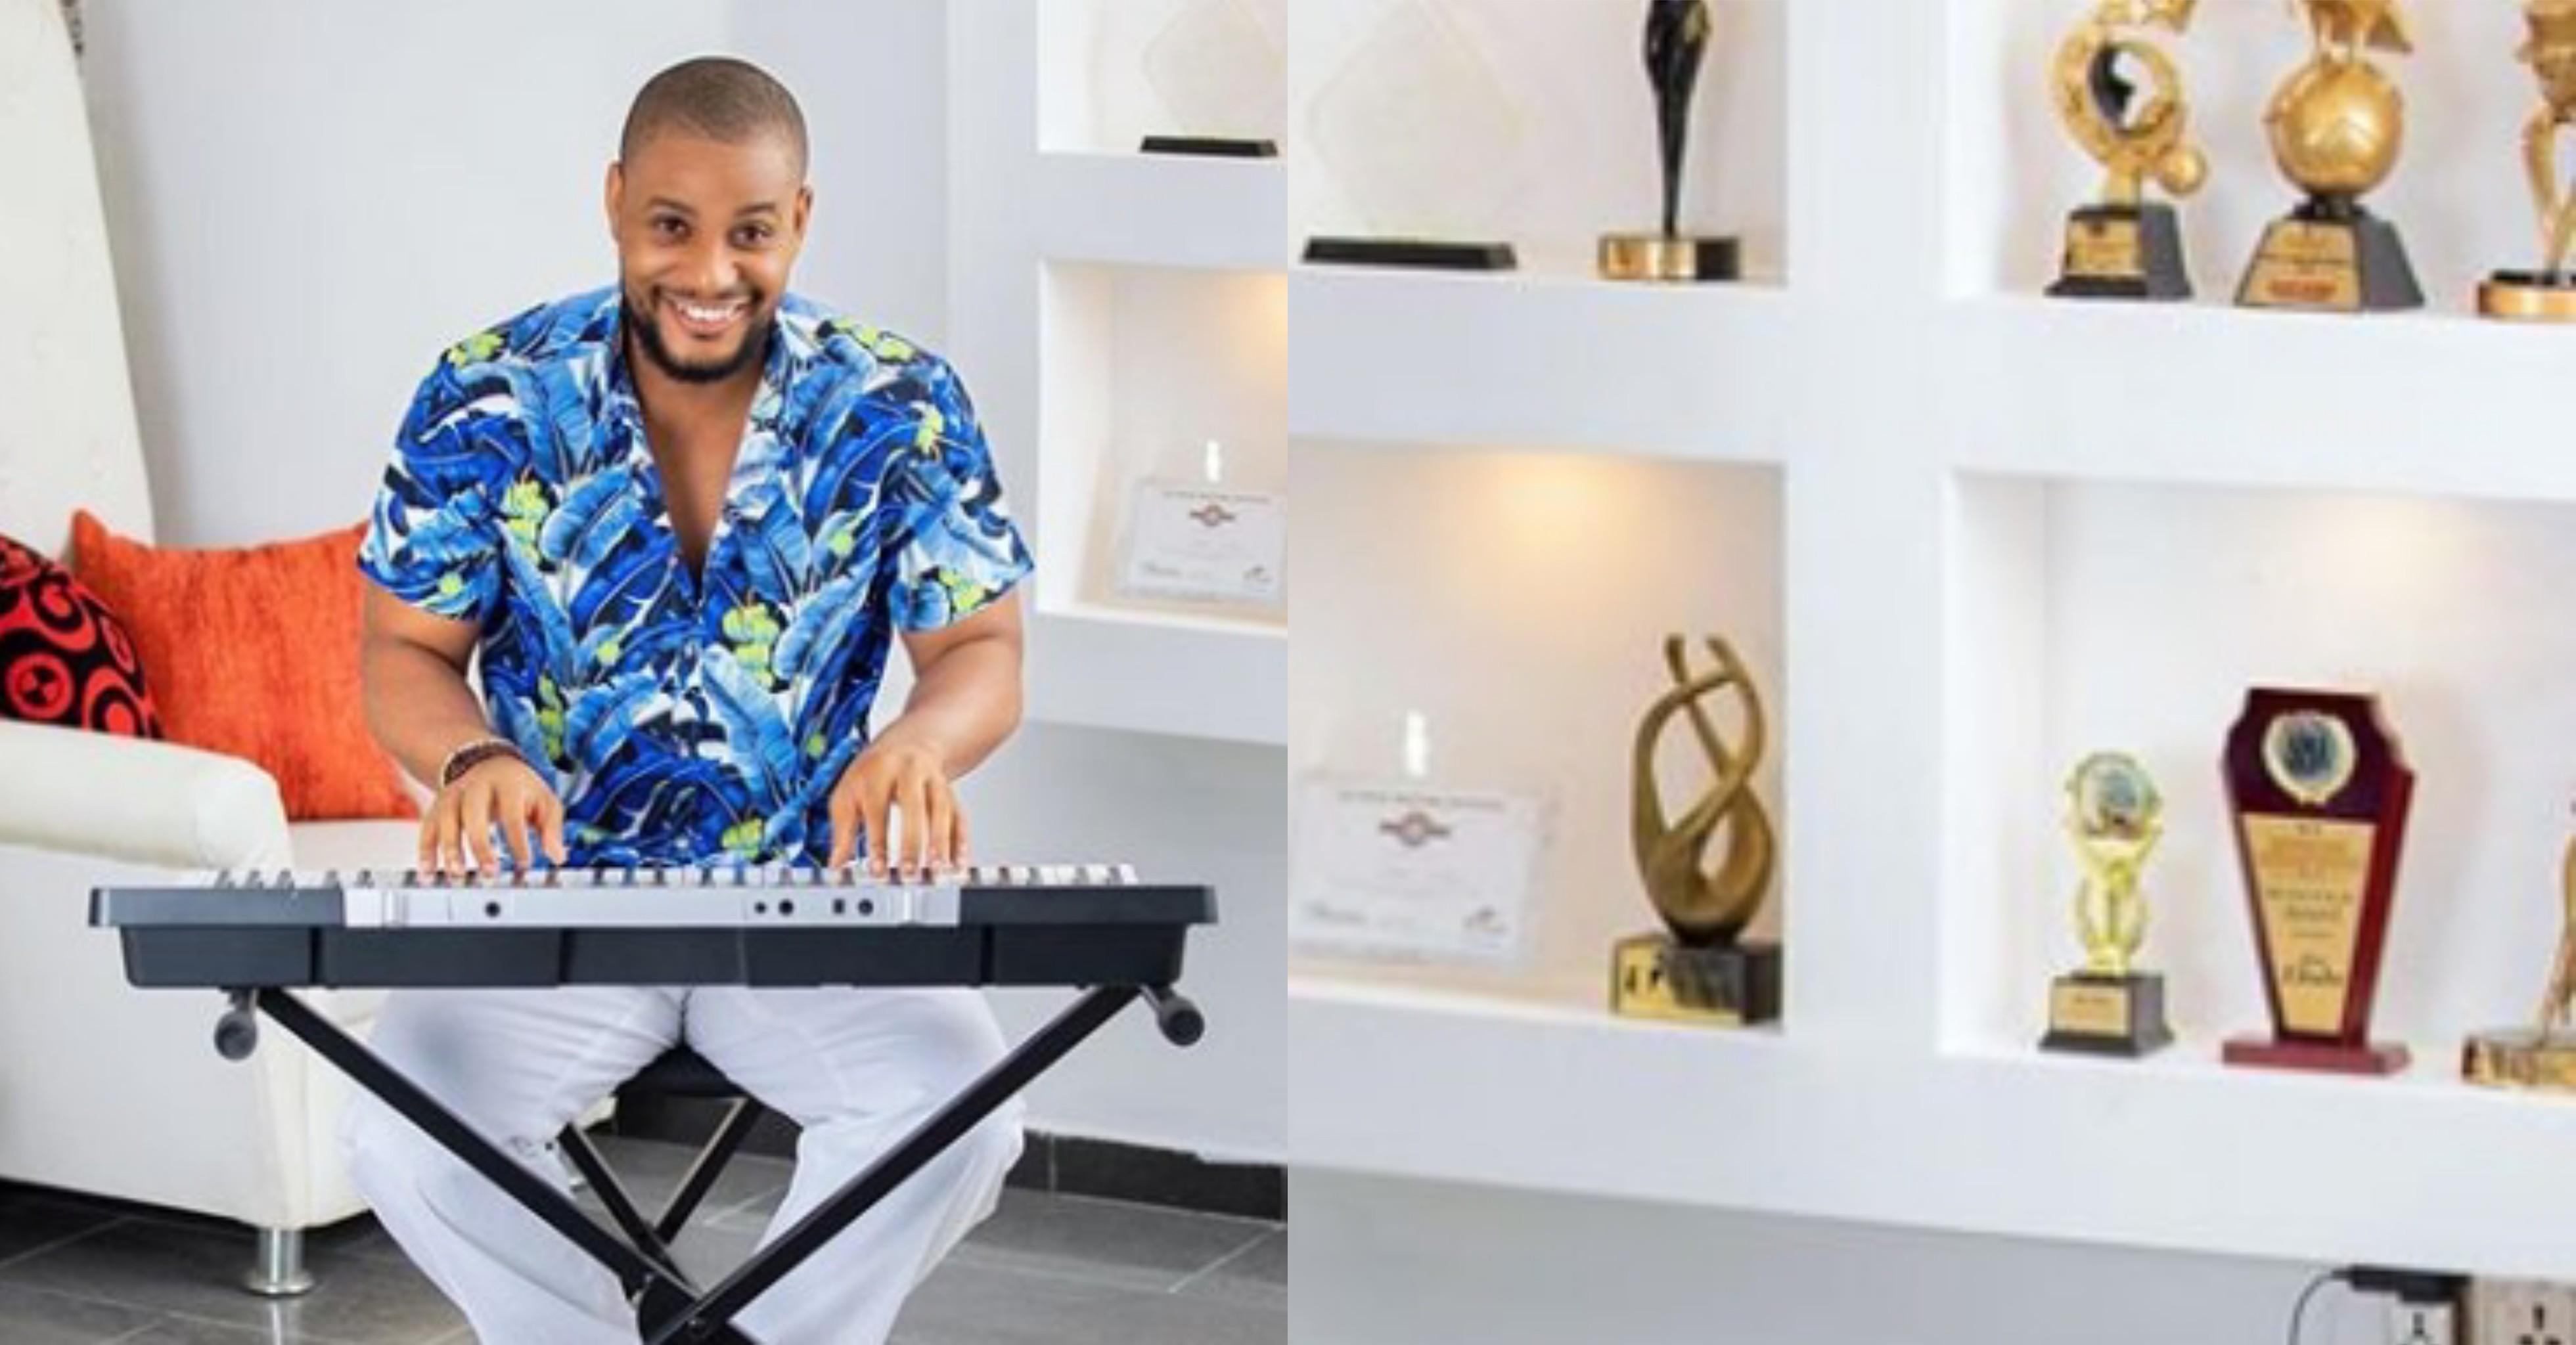 Multi award winning actor, Alexx Ekubo puts his Trophy shelves on display and it's mind-blowing